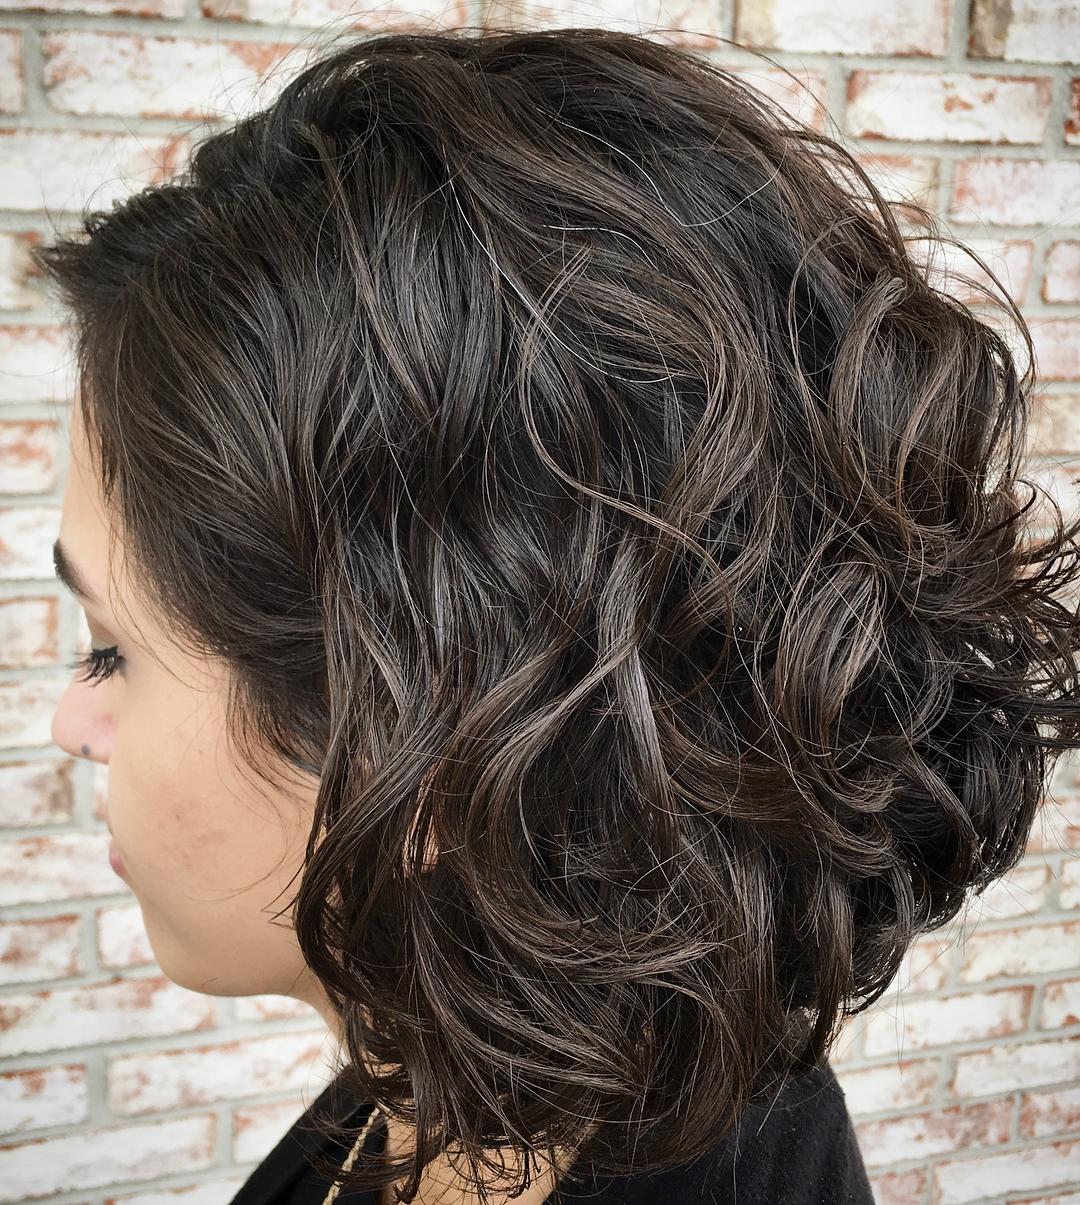 Curly Brunette Lob